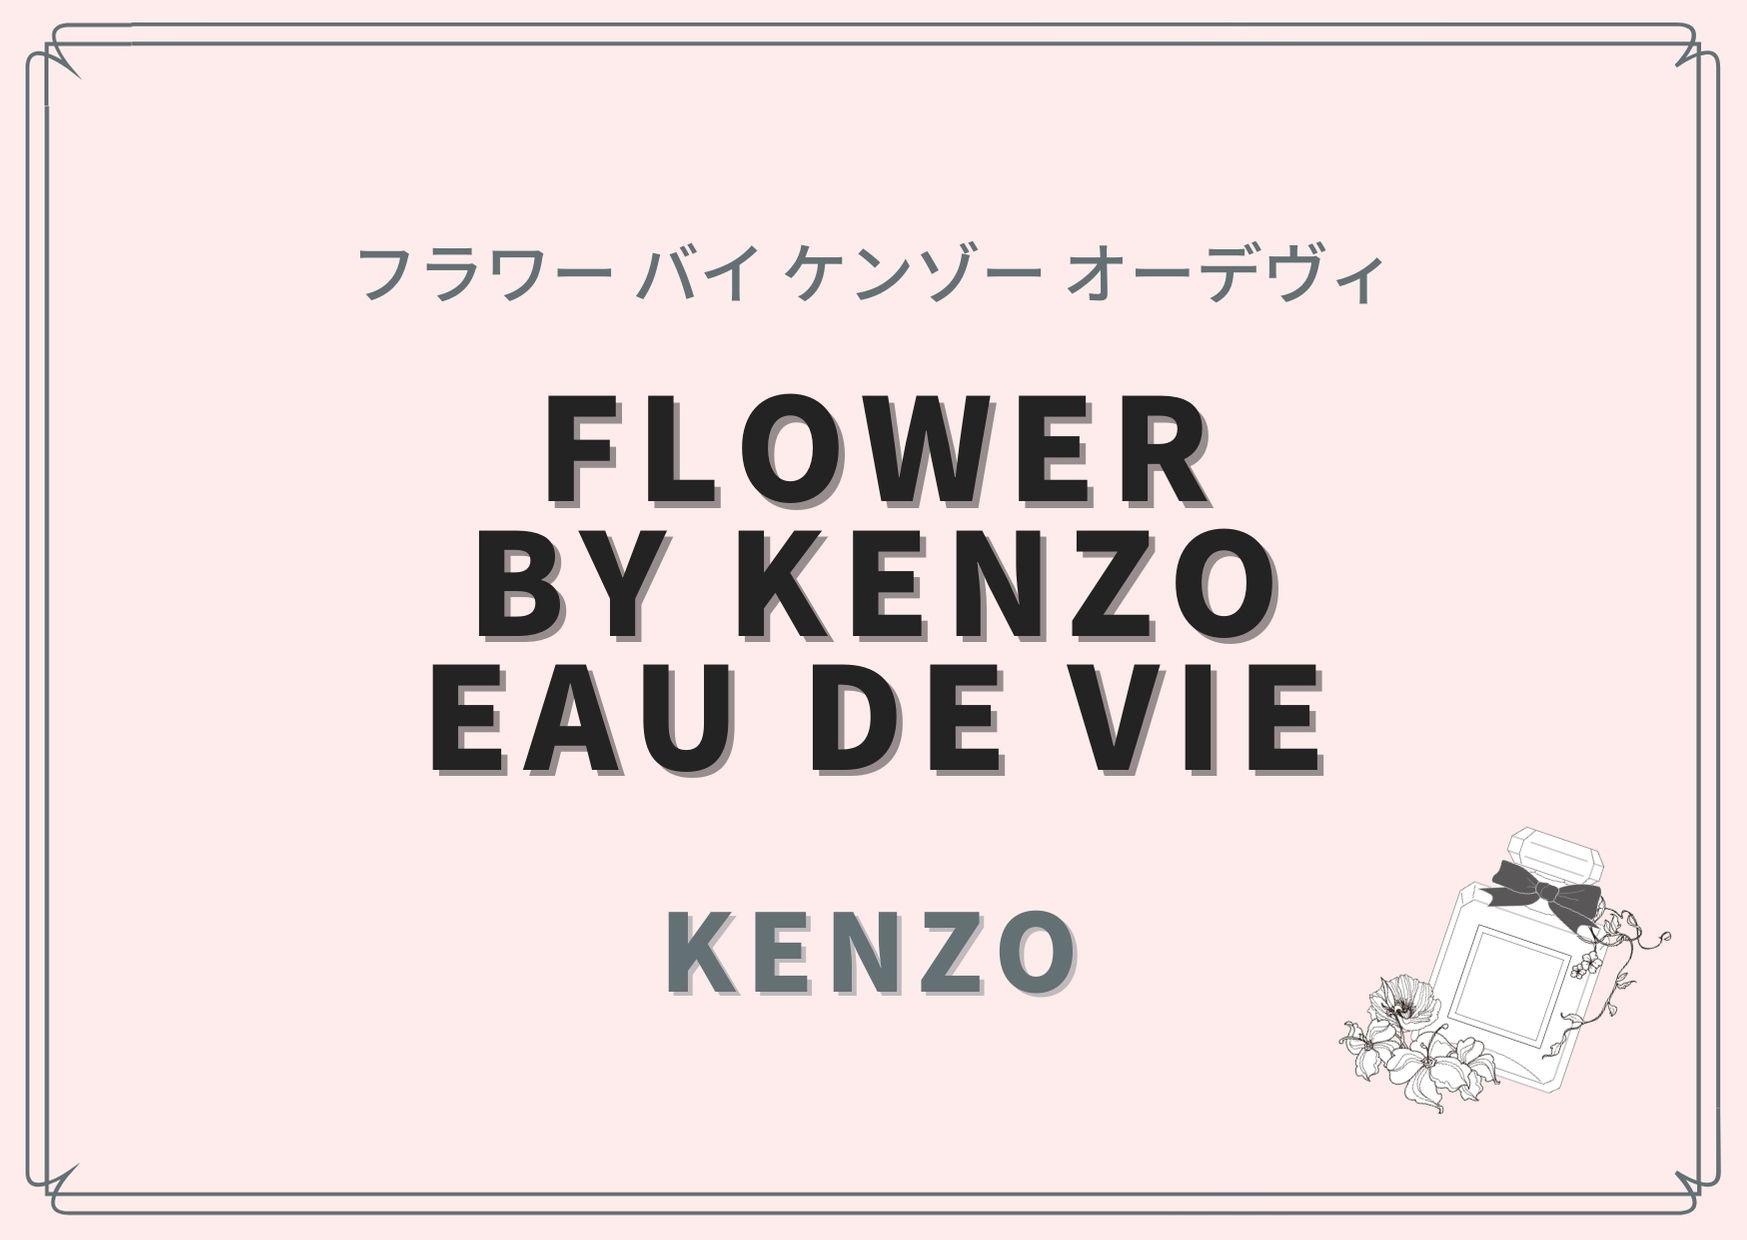 FLOWER by kenzo eau de vie(フラワー バイ ケンゾー オーデヴィ)/KENZO(ケンゾー)